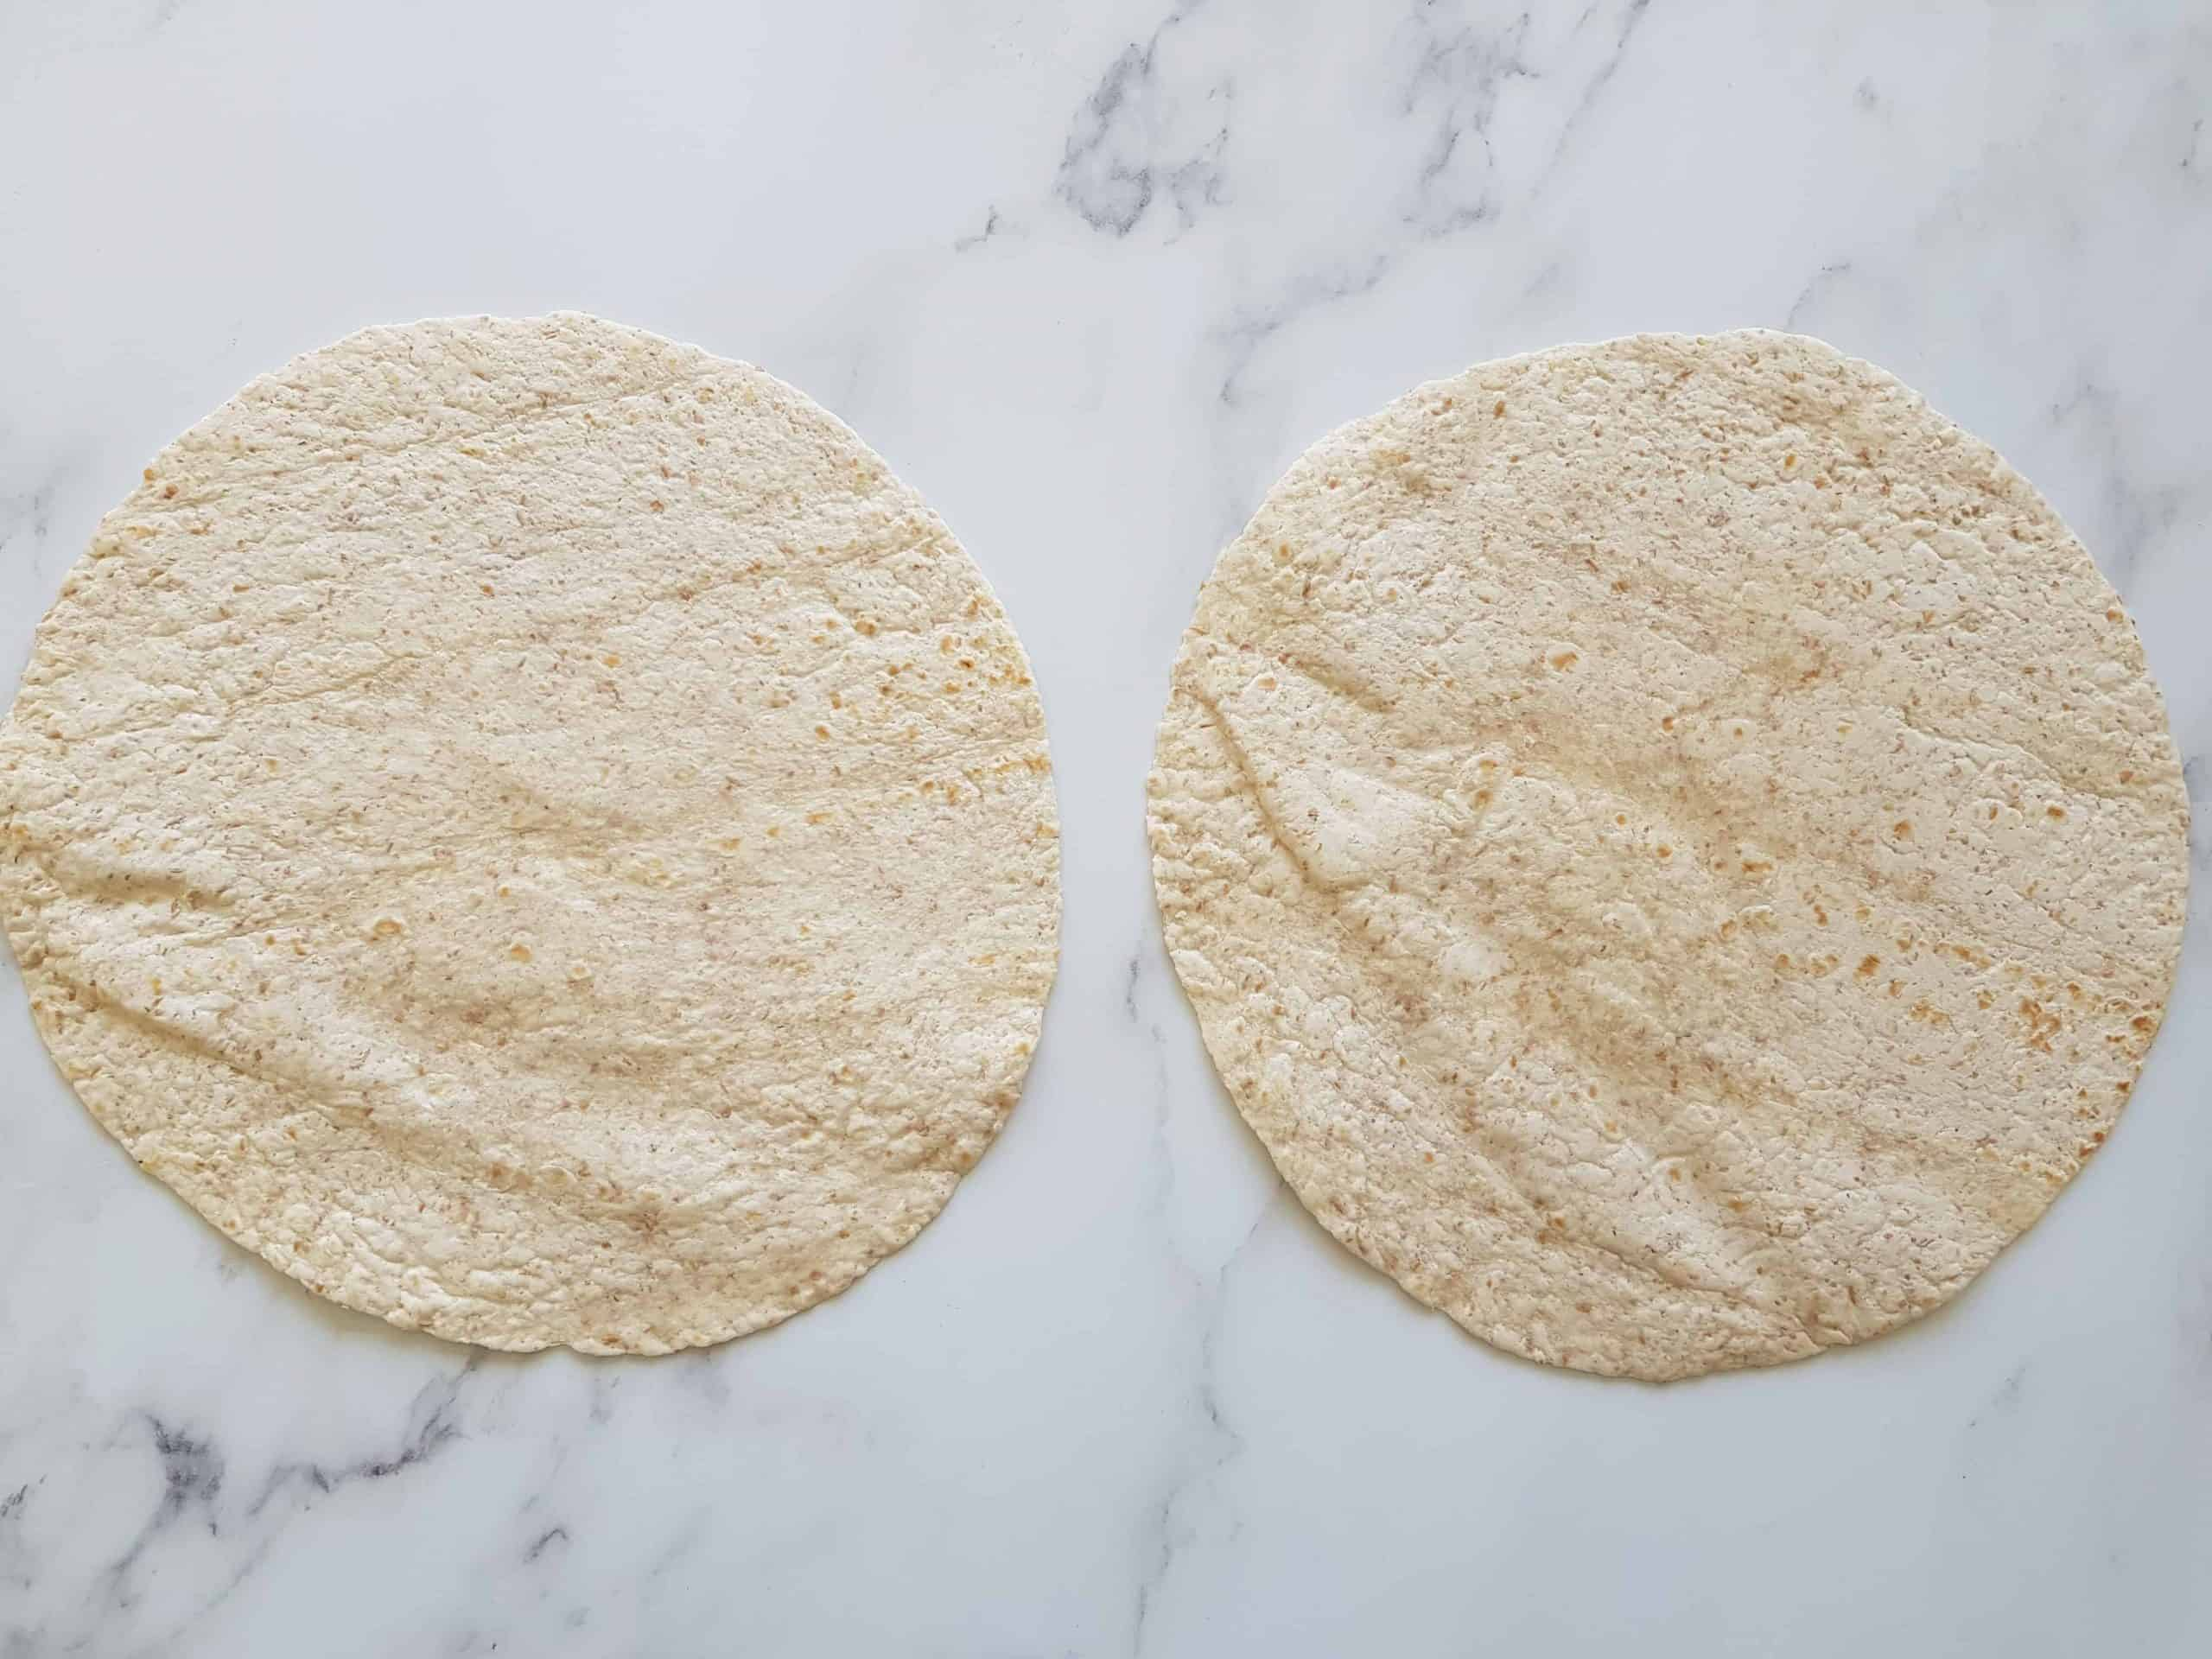 Tortilla wraps on a table.